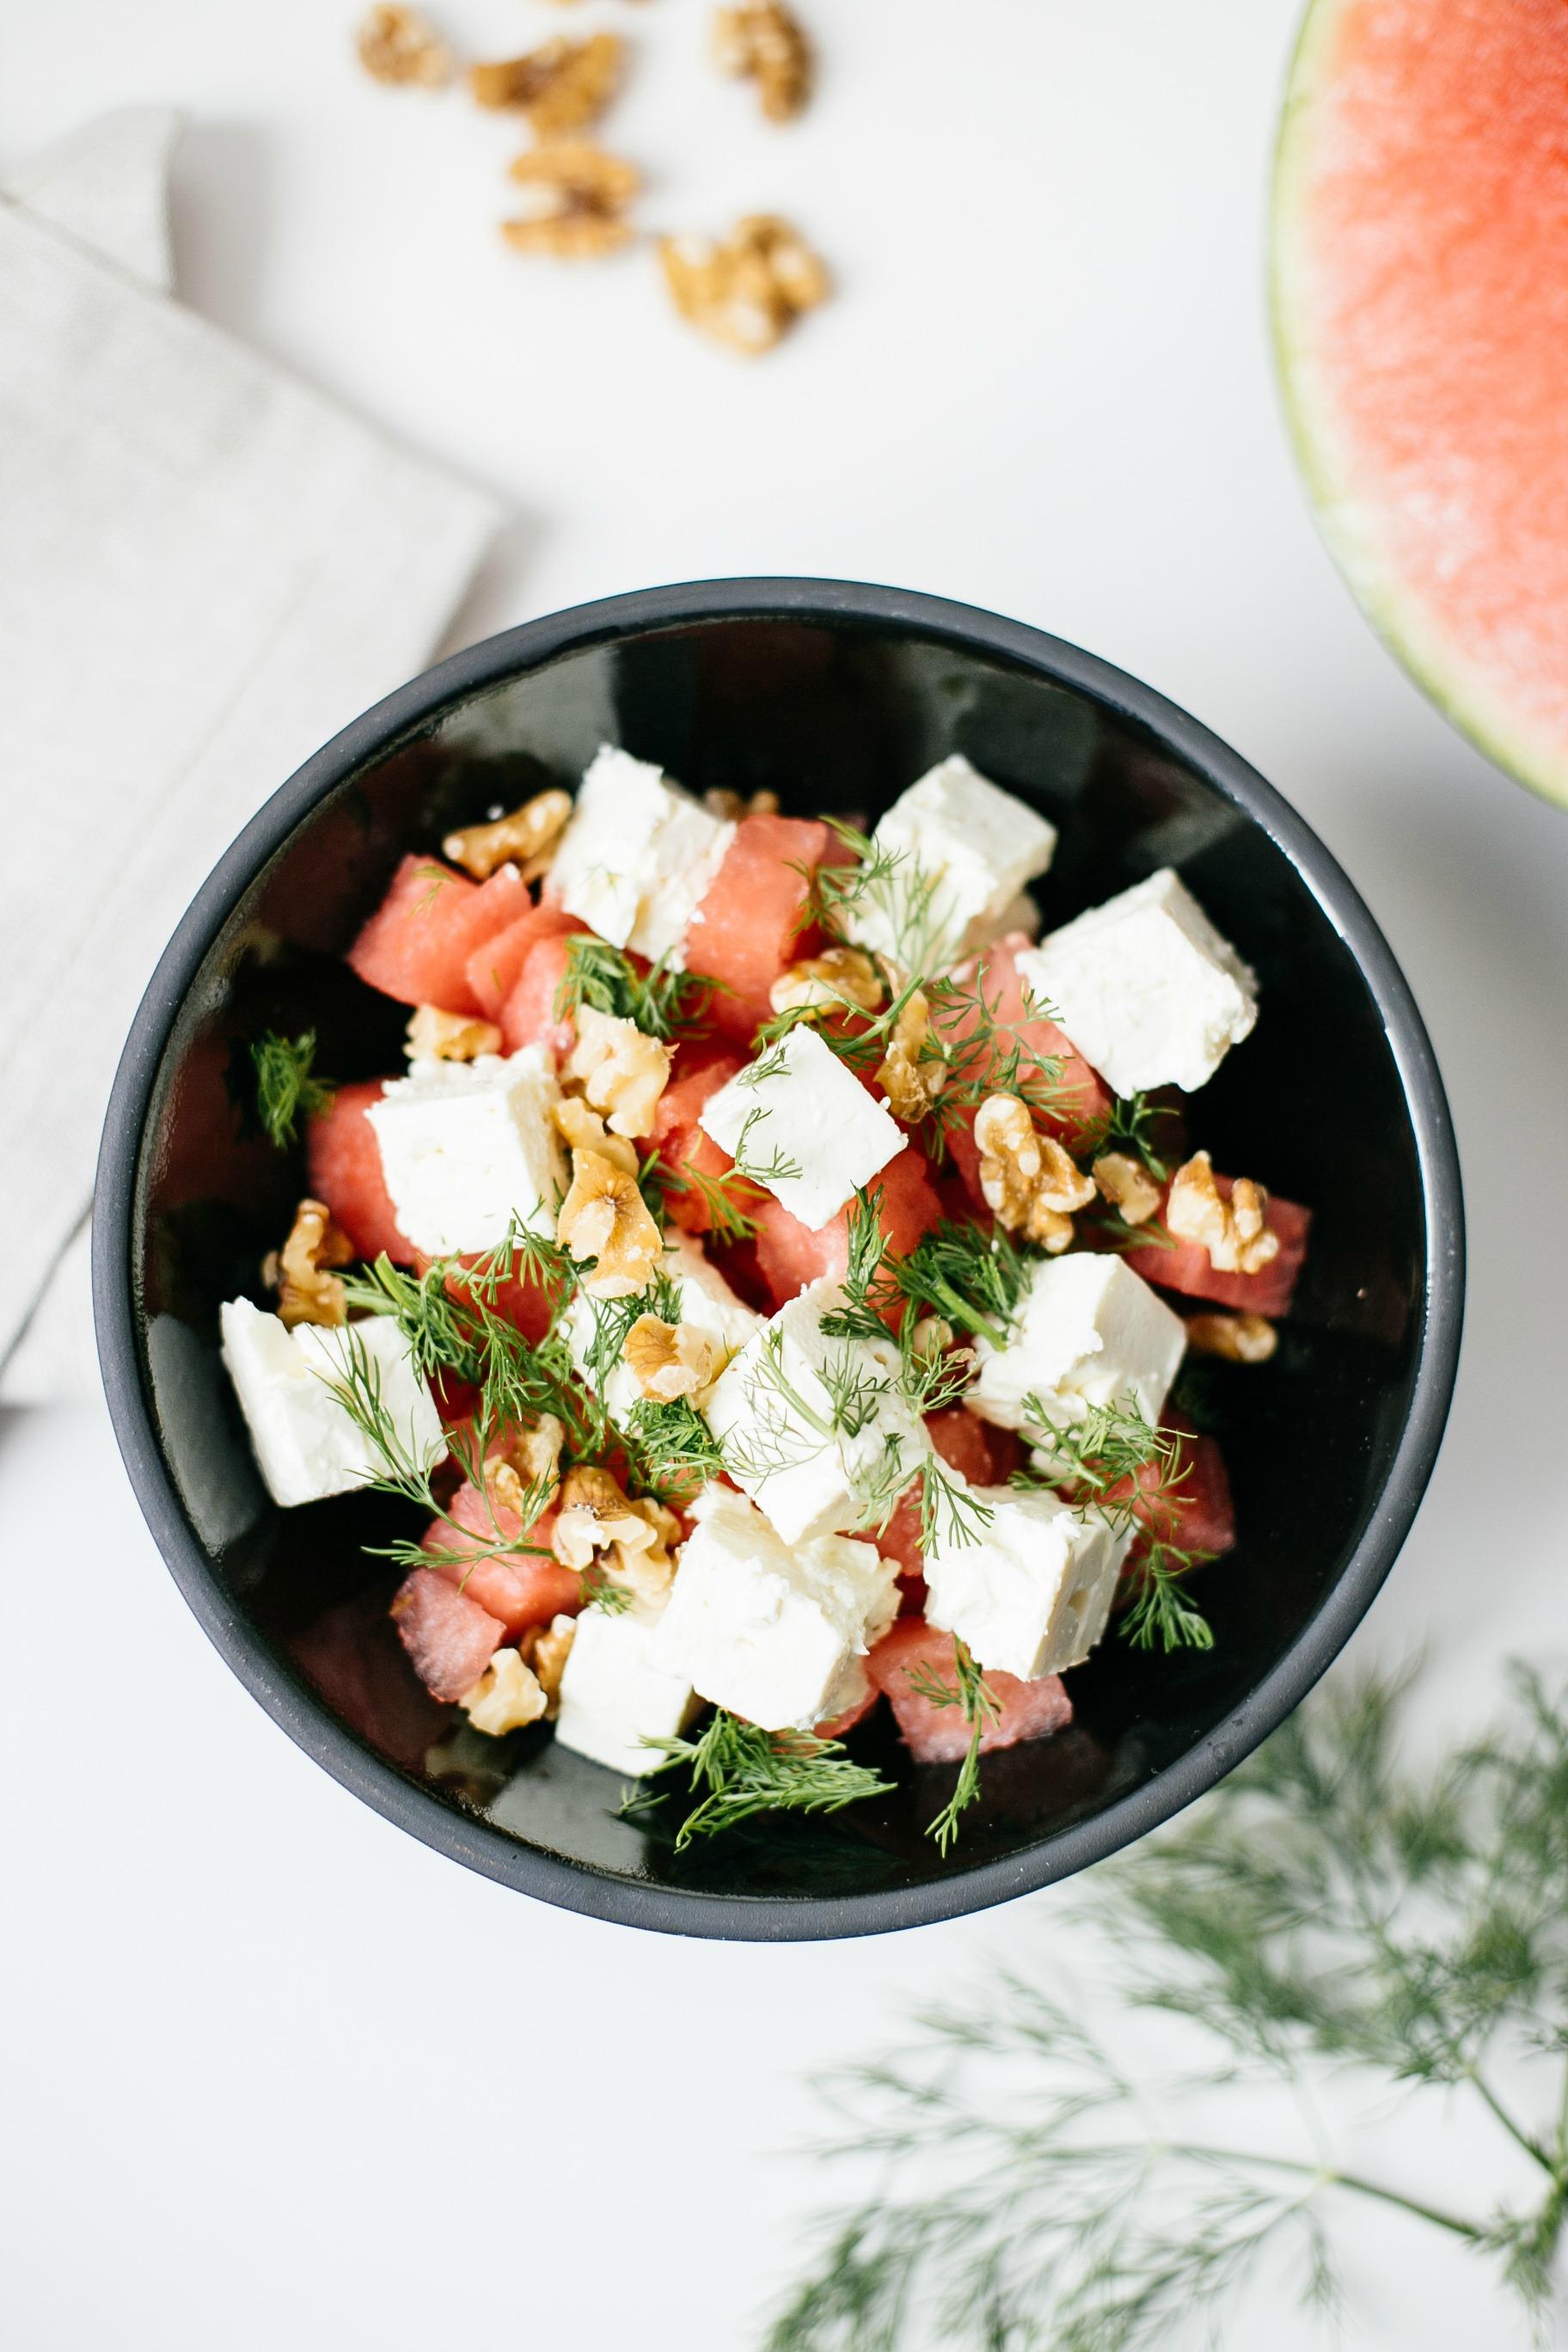 disi-couture-watermelon-avocado-summer-salad-fresh-easy-03